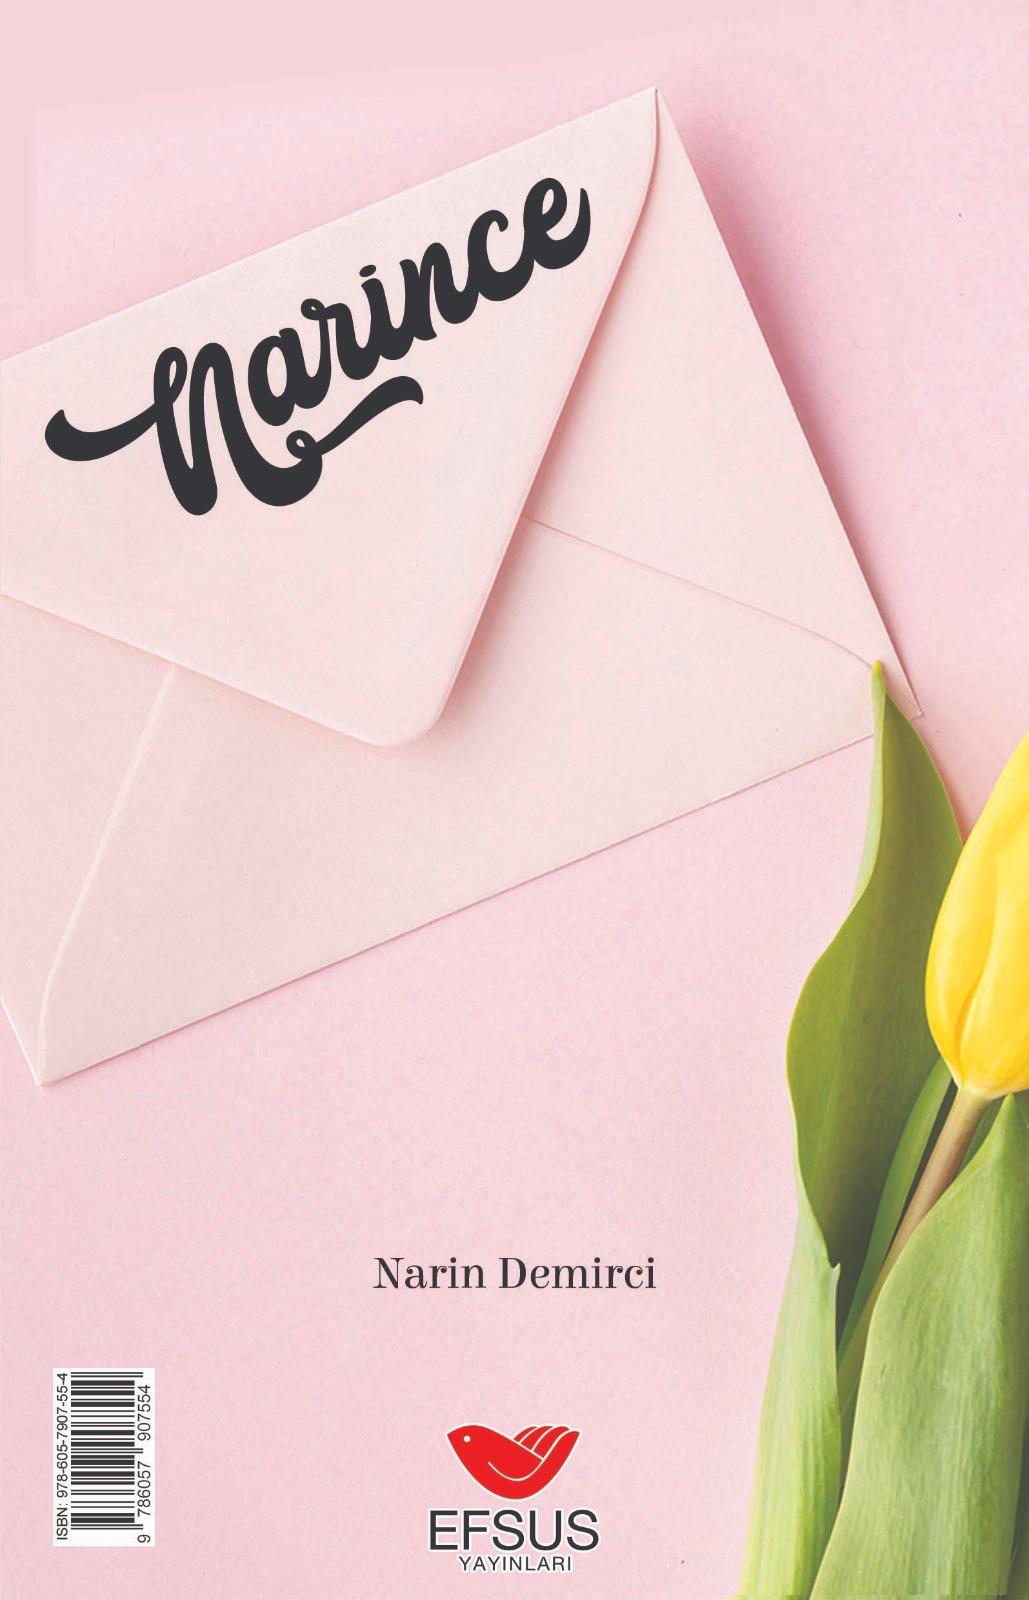 Narince (Çift taraflı kitap)